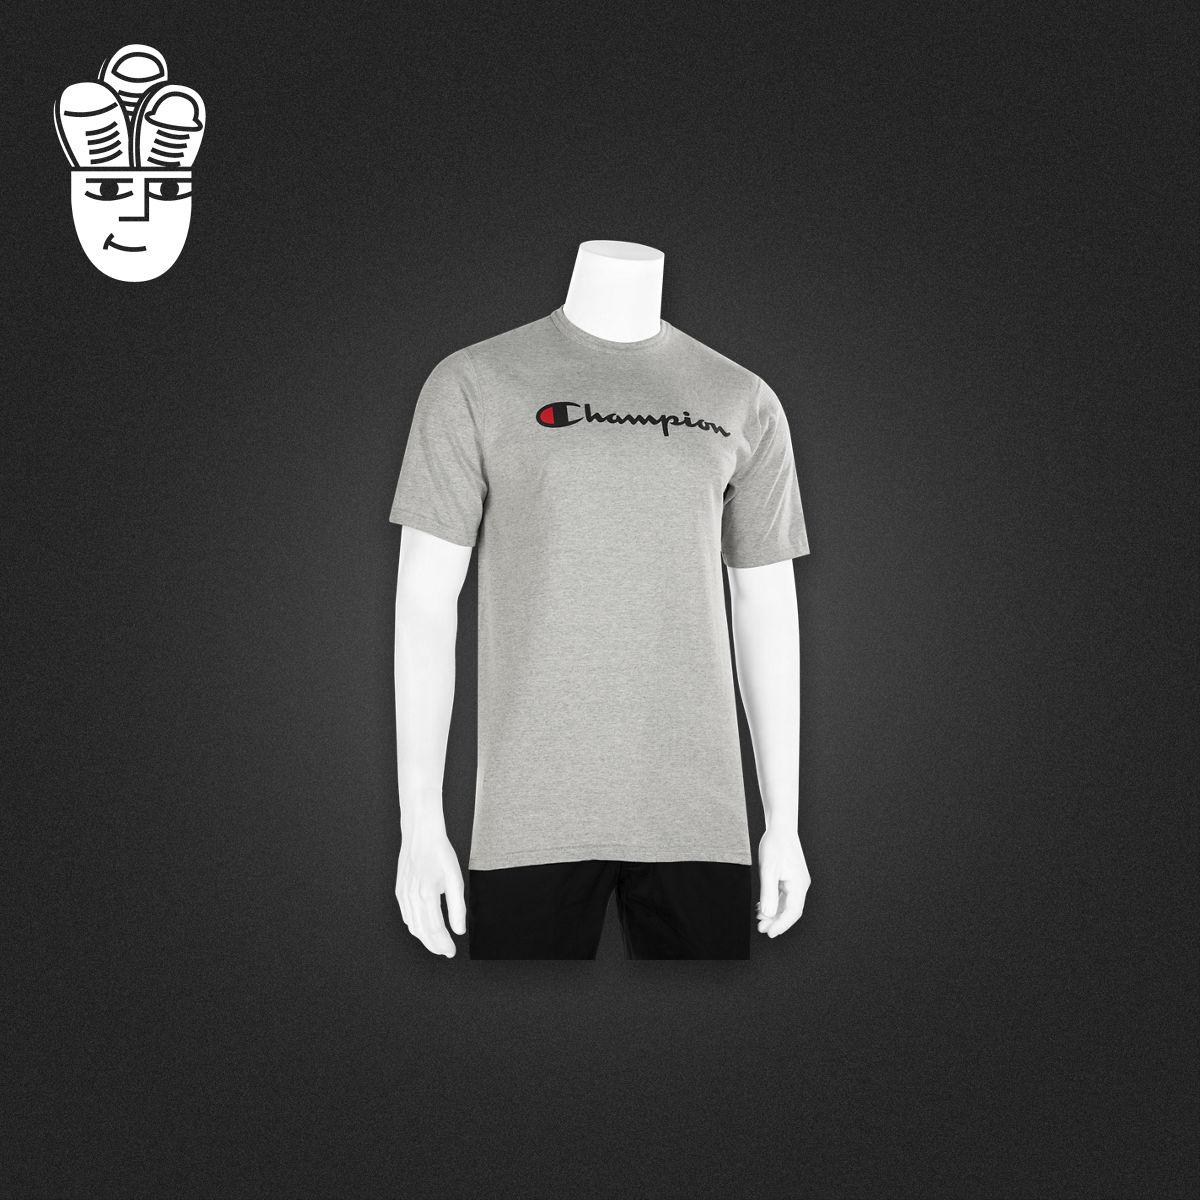 Champion Life Graphic T-Shirt 男子运动休闲T恤衫 字母logo短袖